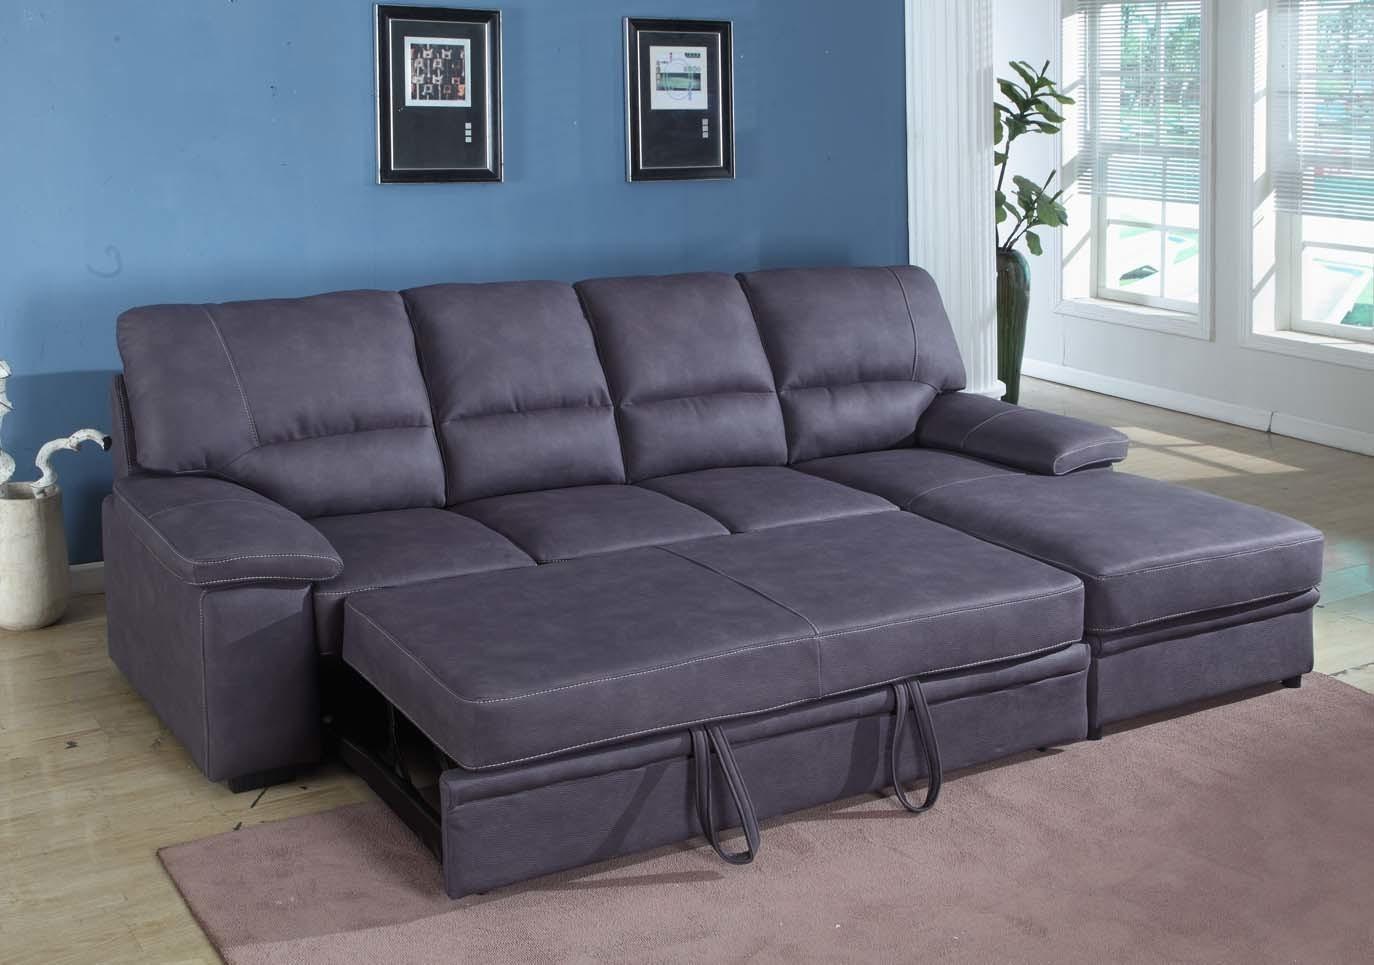 Captivating Queen Sleeper Sofa Ikea Marvelous Home Design Regarding Cheap Sofas Houston (Image 4 of 20)